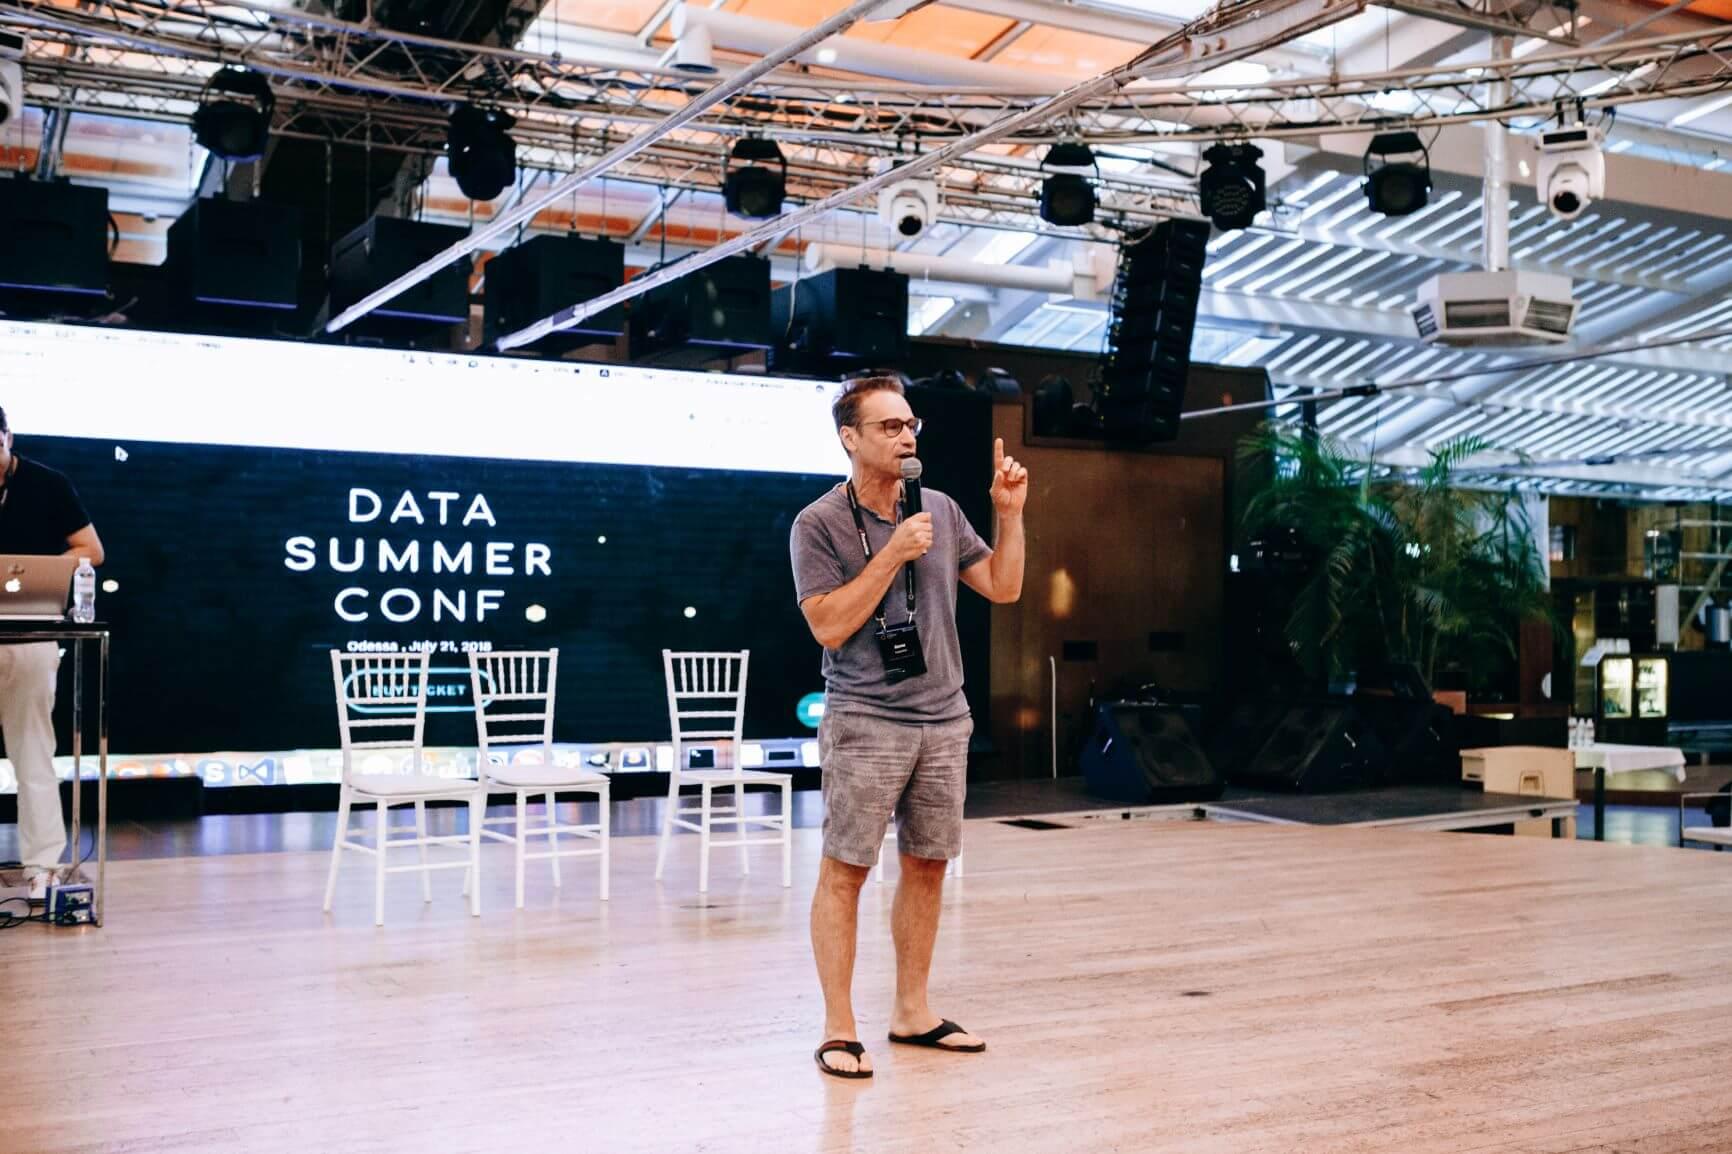 DataSummer Conference